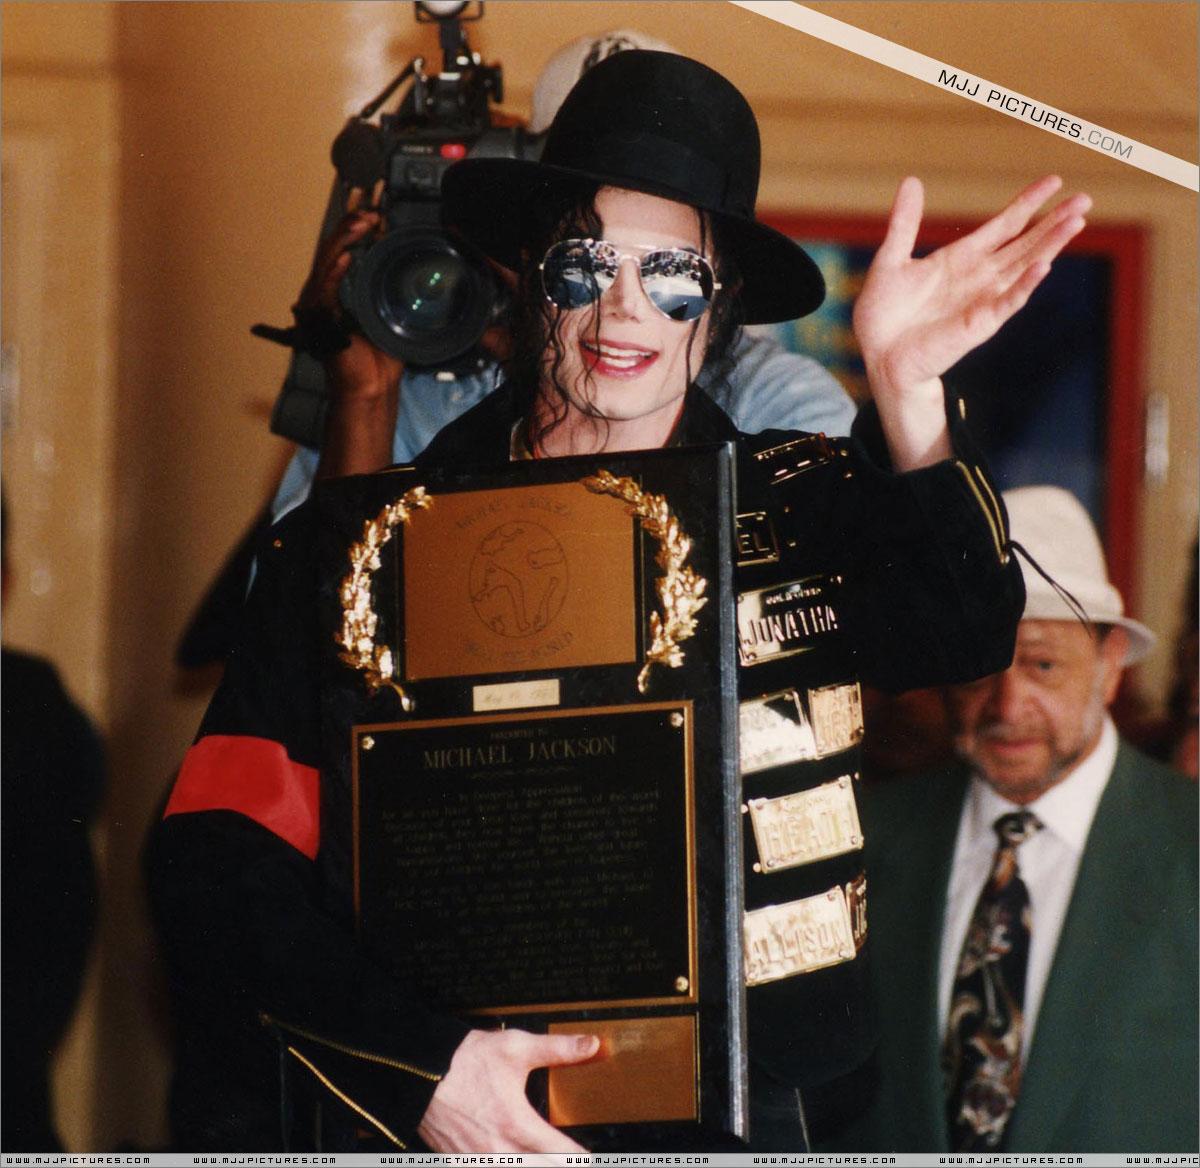 http://2.bp.blogspot.com/-6uEXji0pKho/T66gE6fDJKI/AAAAAAAAFW0/hTnxJPAALXQ/s1600/michael_jackson_awards_guinness_may_1993.jpg